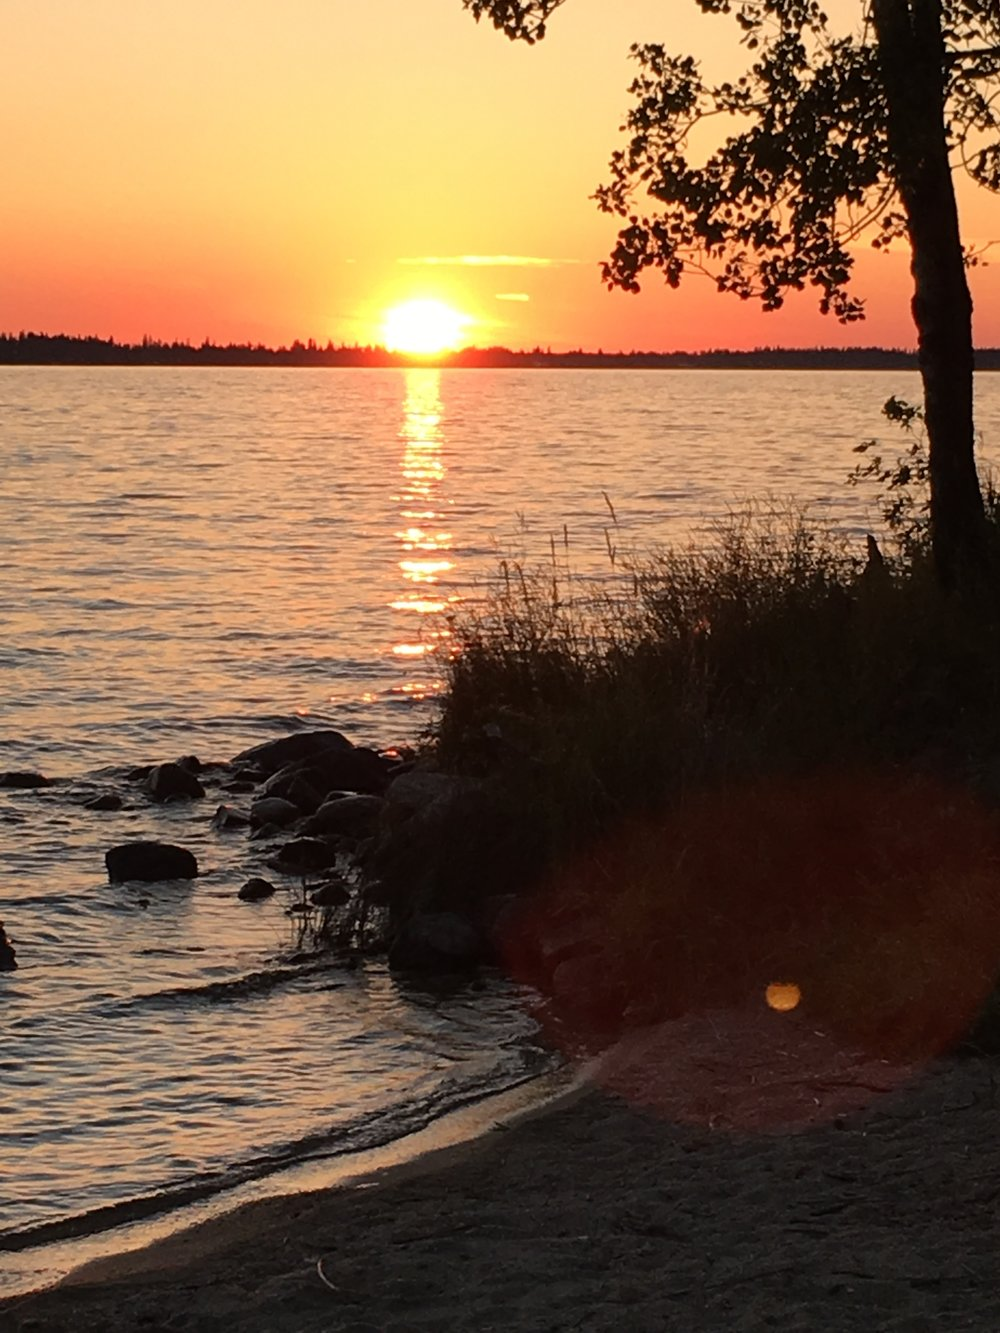 2016-08-16 Candle Lake